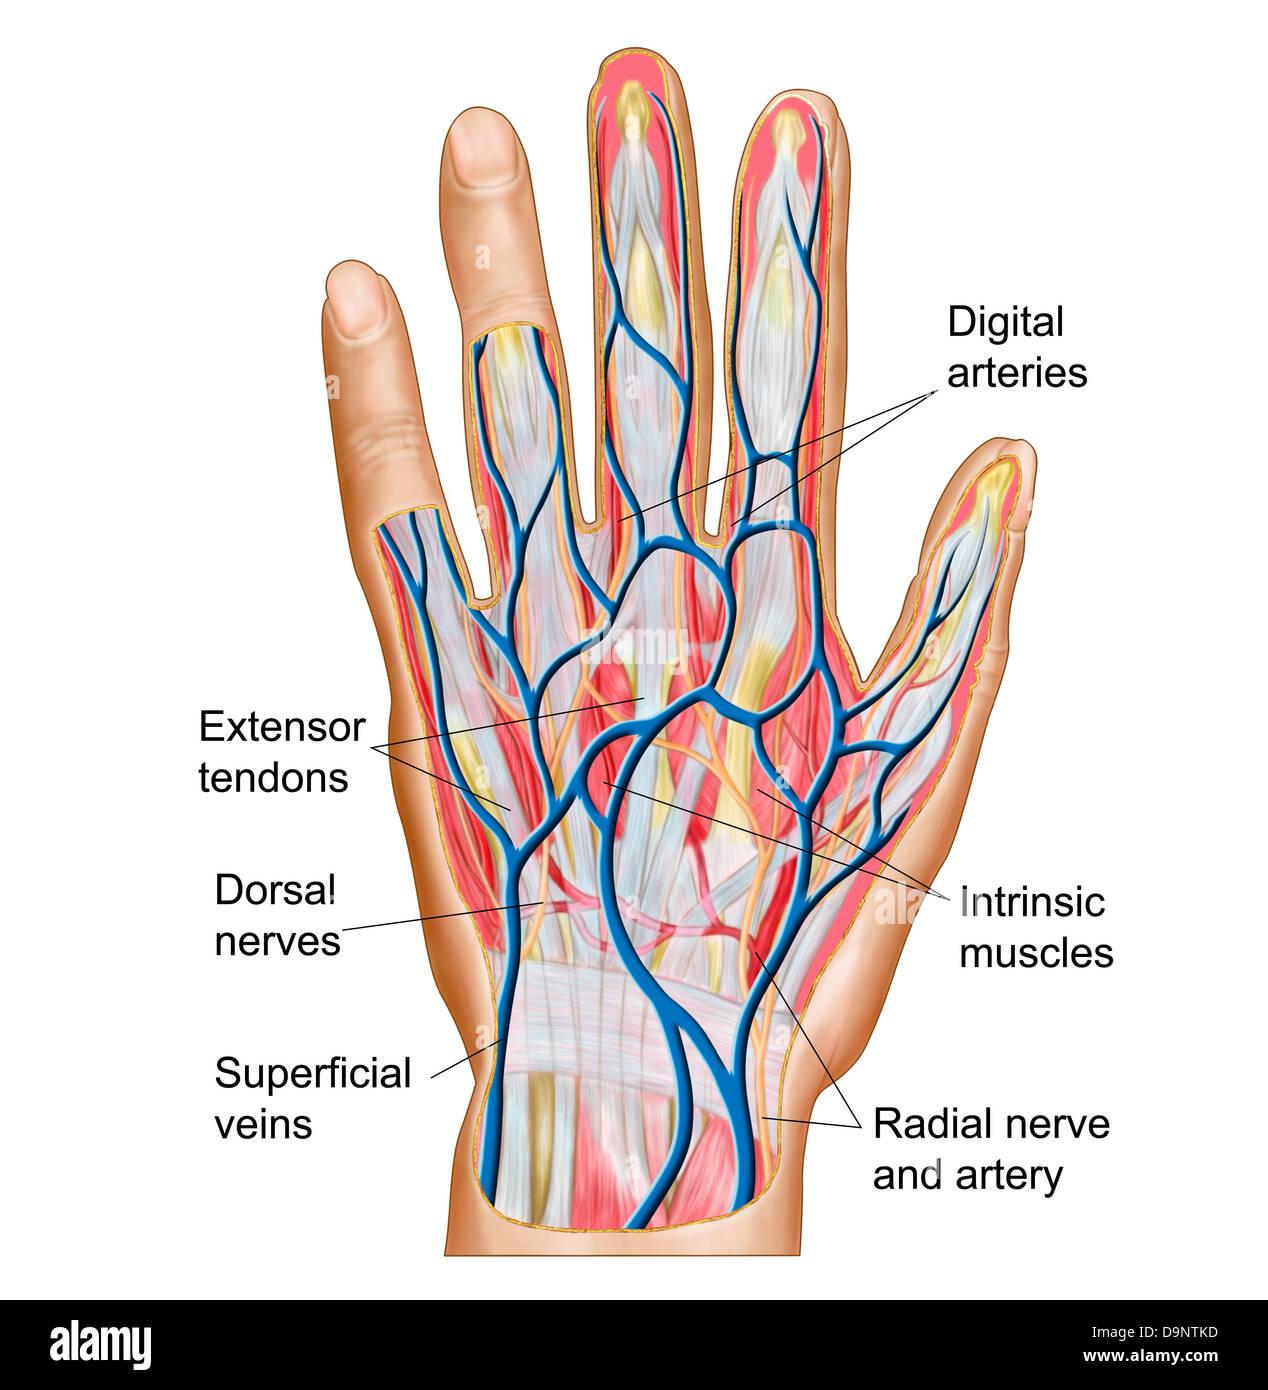 hand nerves diagram ww1 tank stock photos images alamy anatomy of back human image